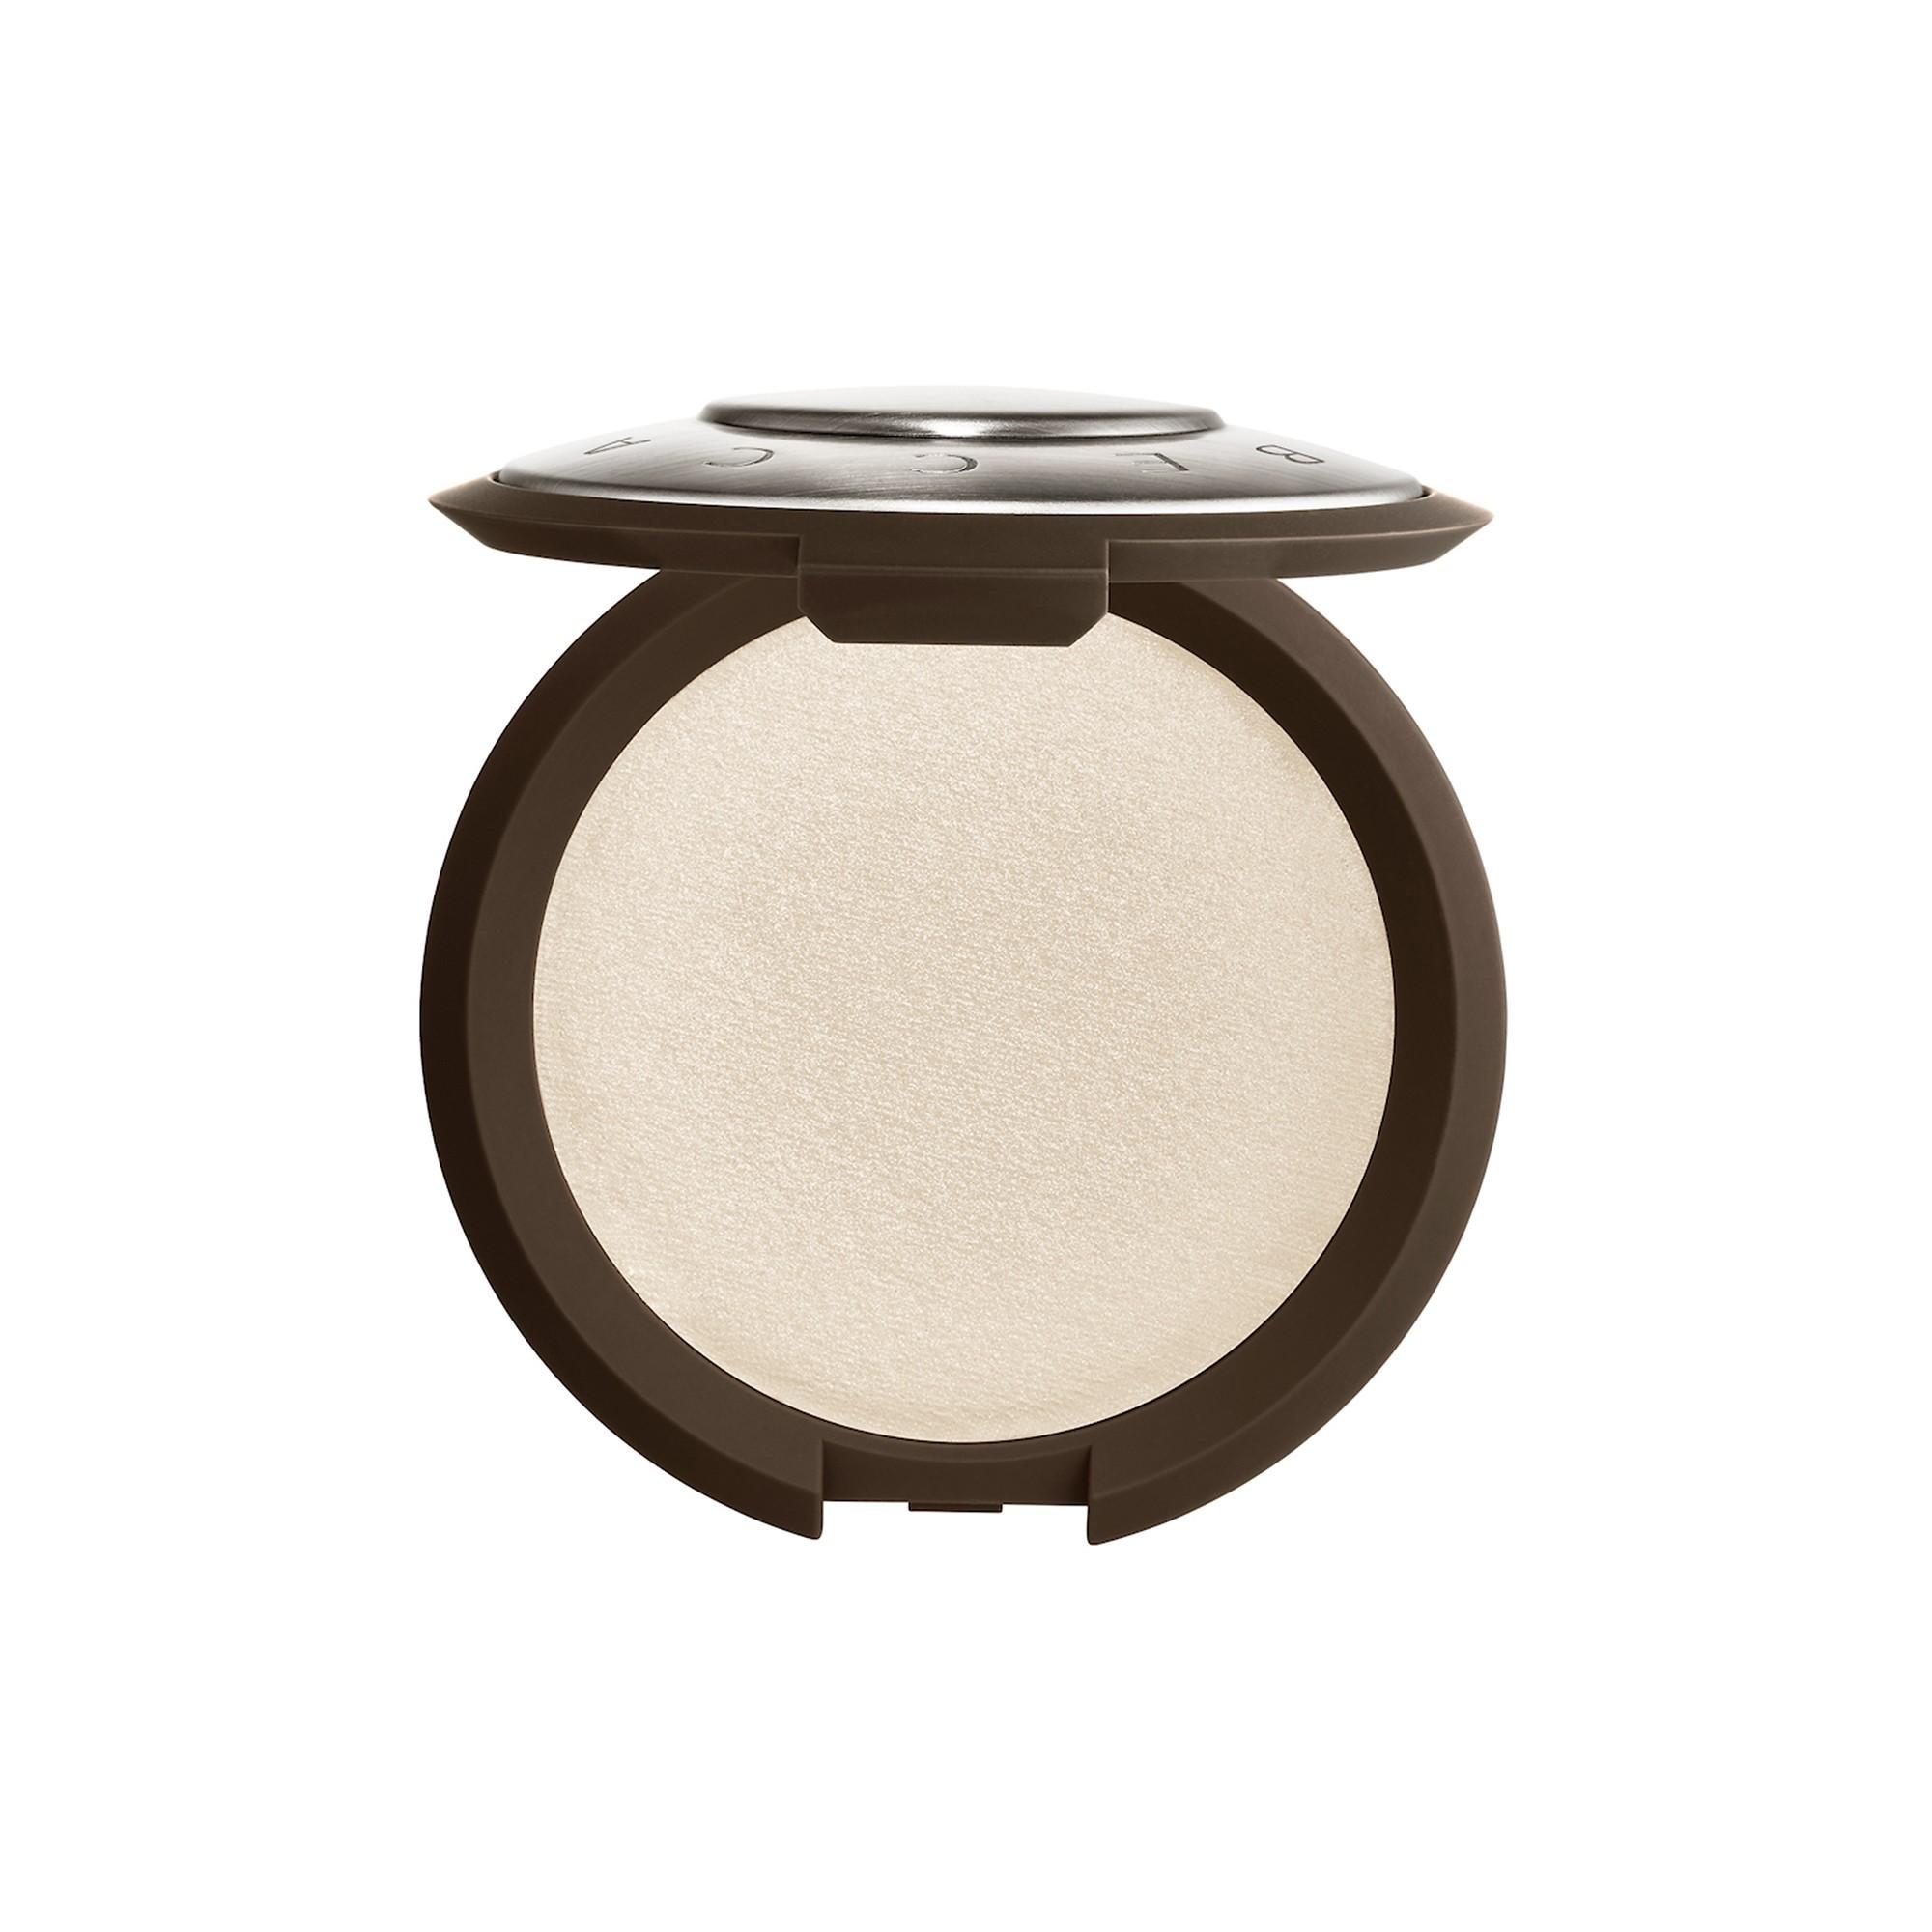 #Pearl 珠光 / Shimmering Skin Perfector™ Pressed Highlighter 光芒肌修颜高光粉饼 (高光小飞碟)